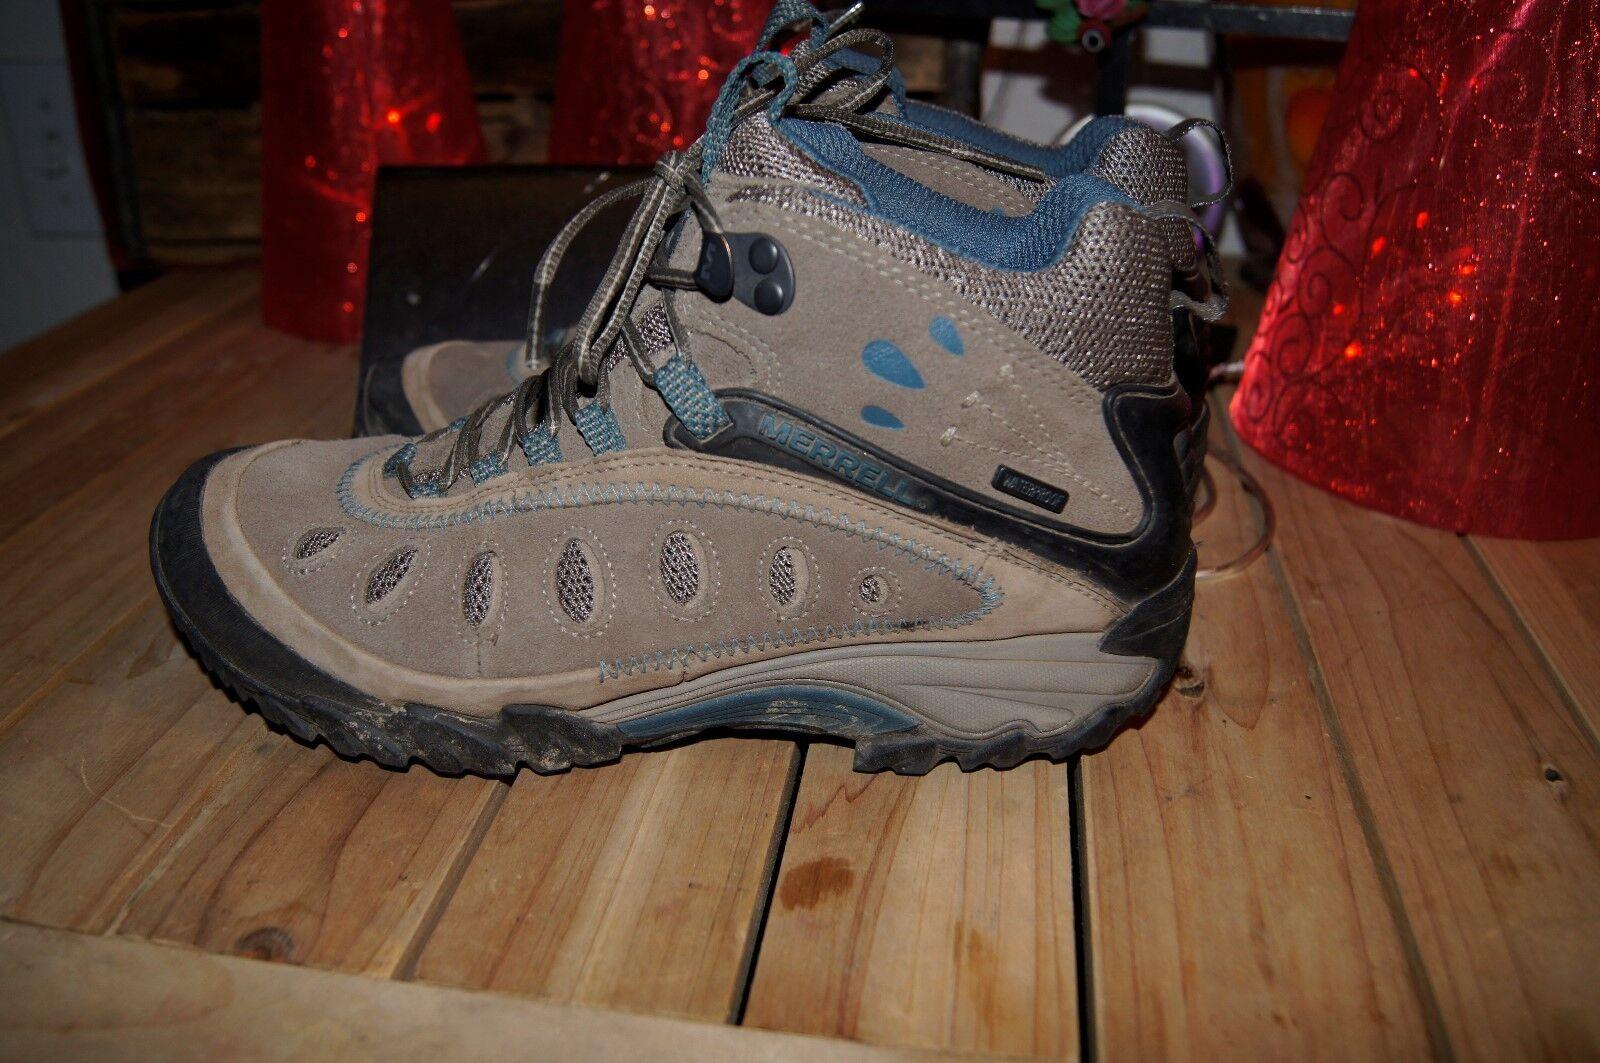 merrell boots 7.5  hiking boots 7.5 waterproof boots 7.5 merrells 7.5 Worn once